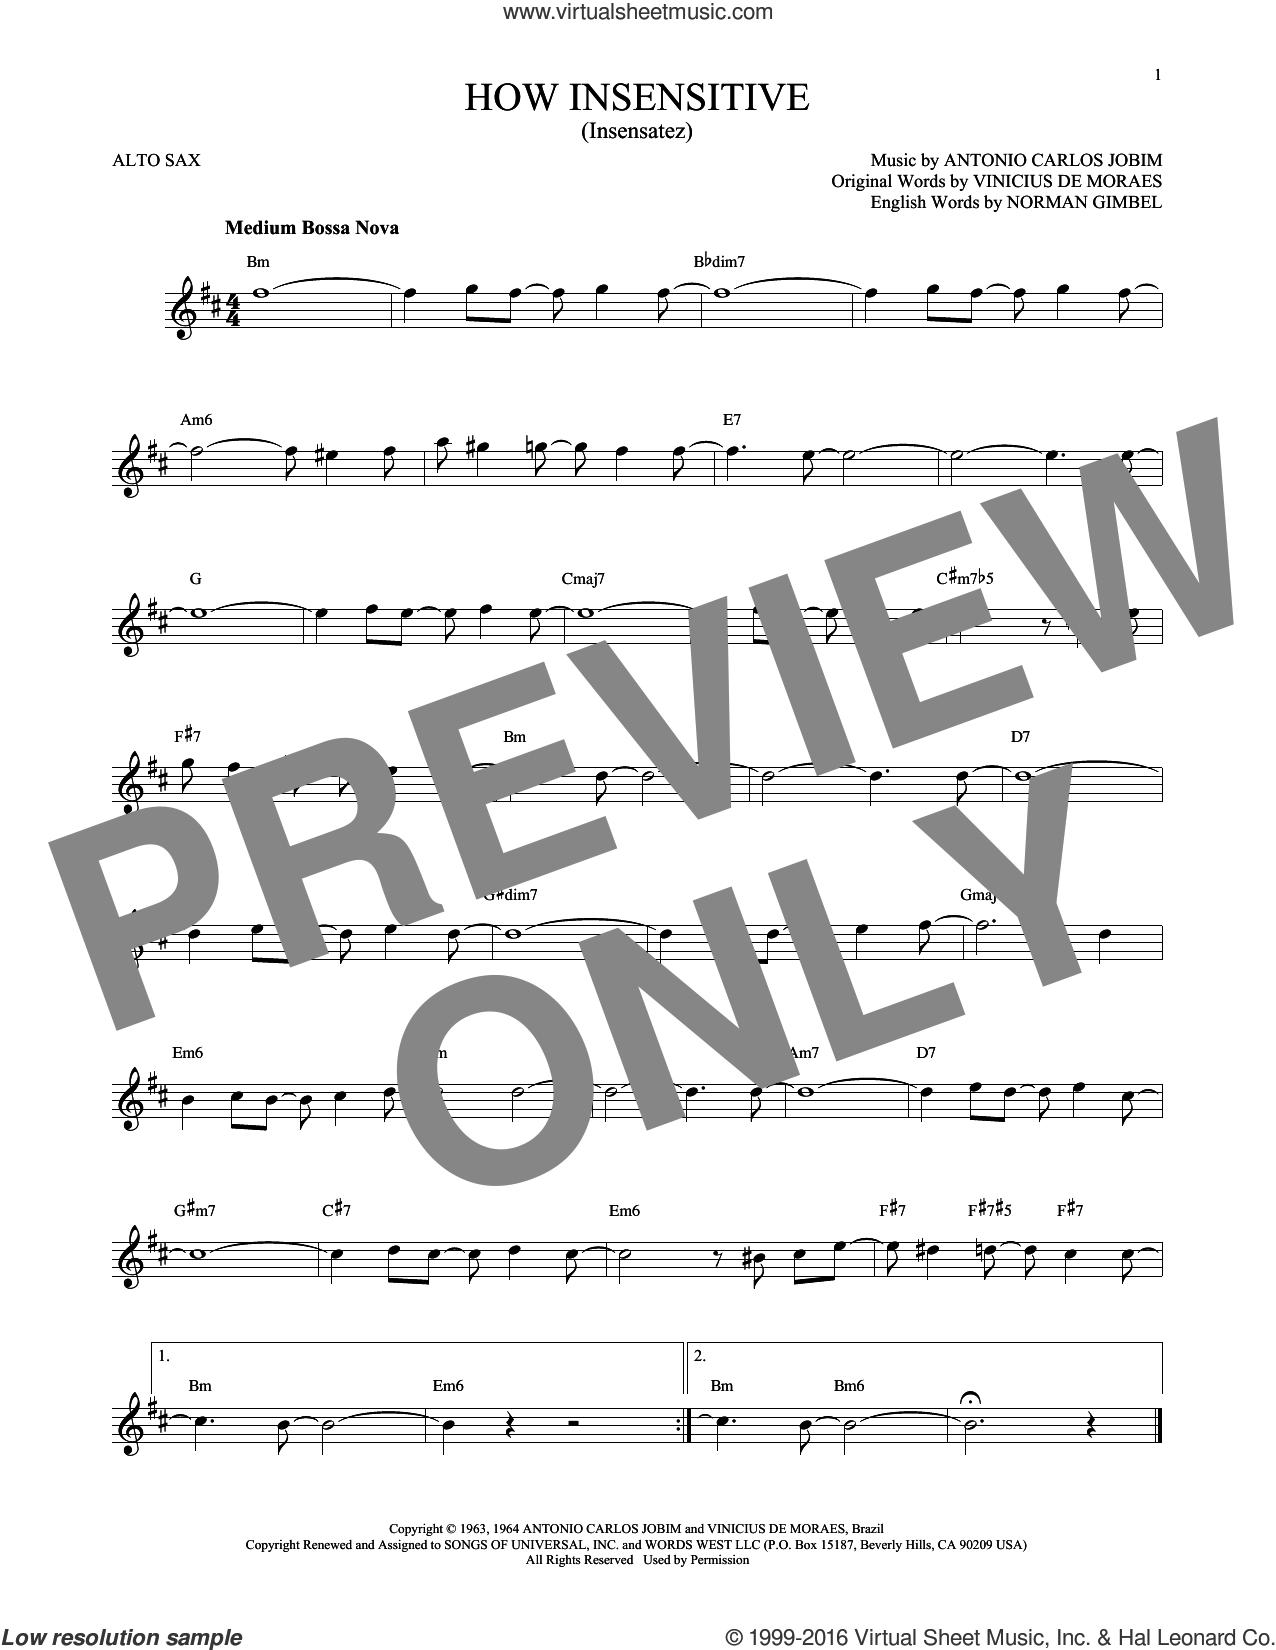 How Insensitive (Insensatez) sheet music for alto saxophone solo by Norman Gimbel, Astrud Gilberto, Antonio Carlos Jobim and Vinicius de Moraes, intermediate skill level